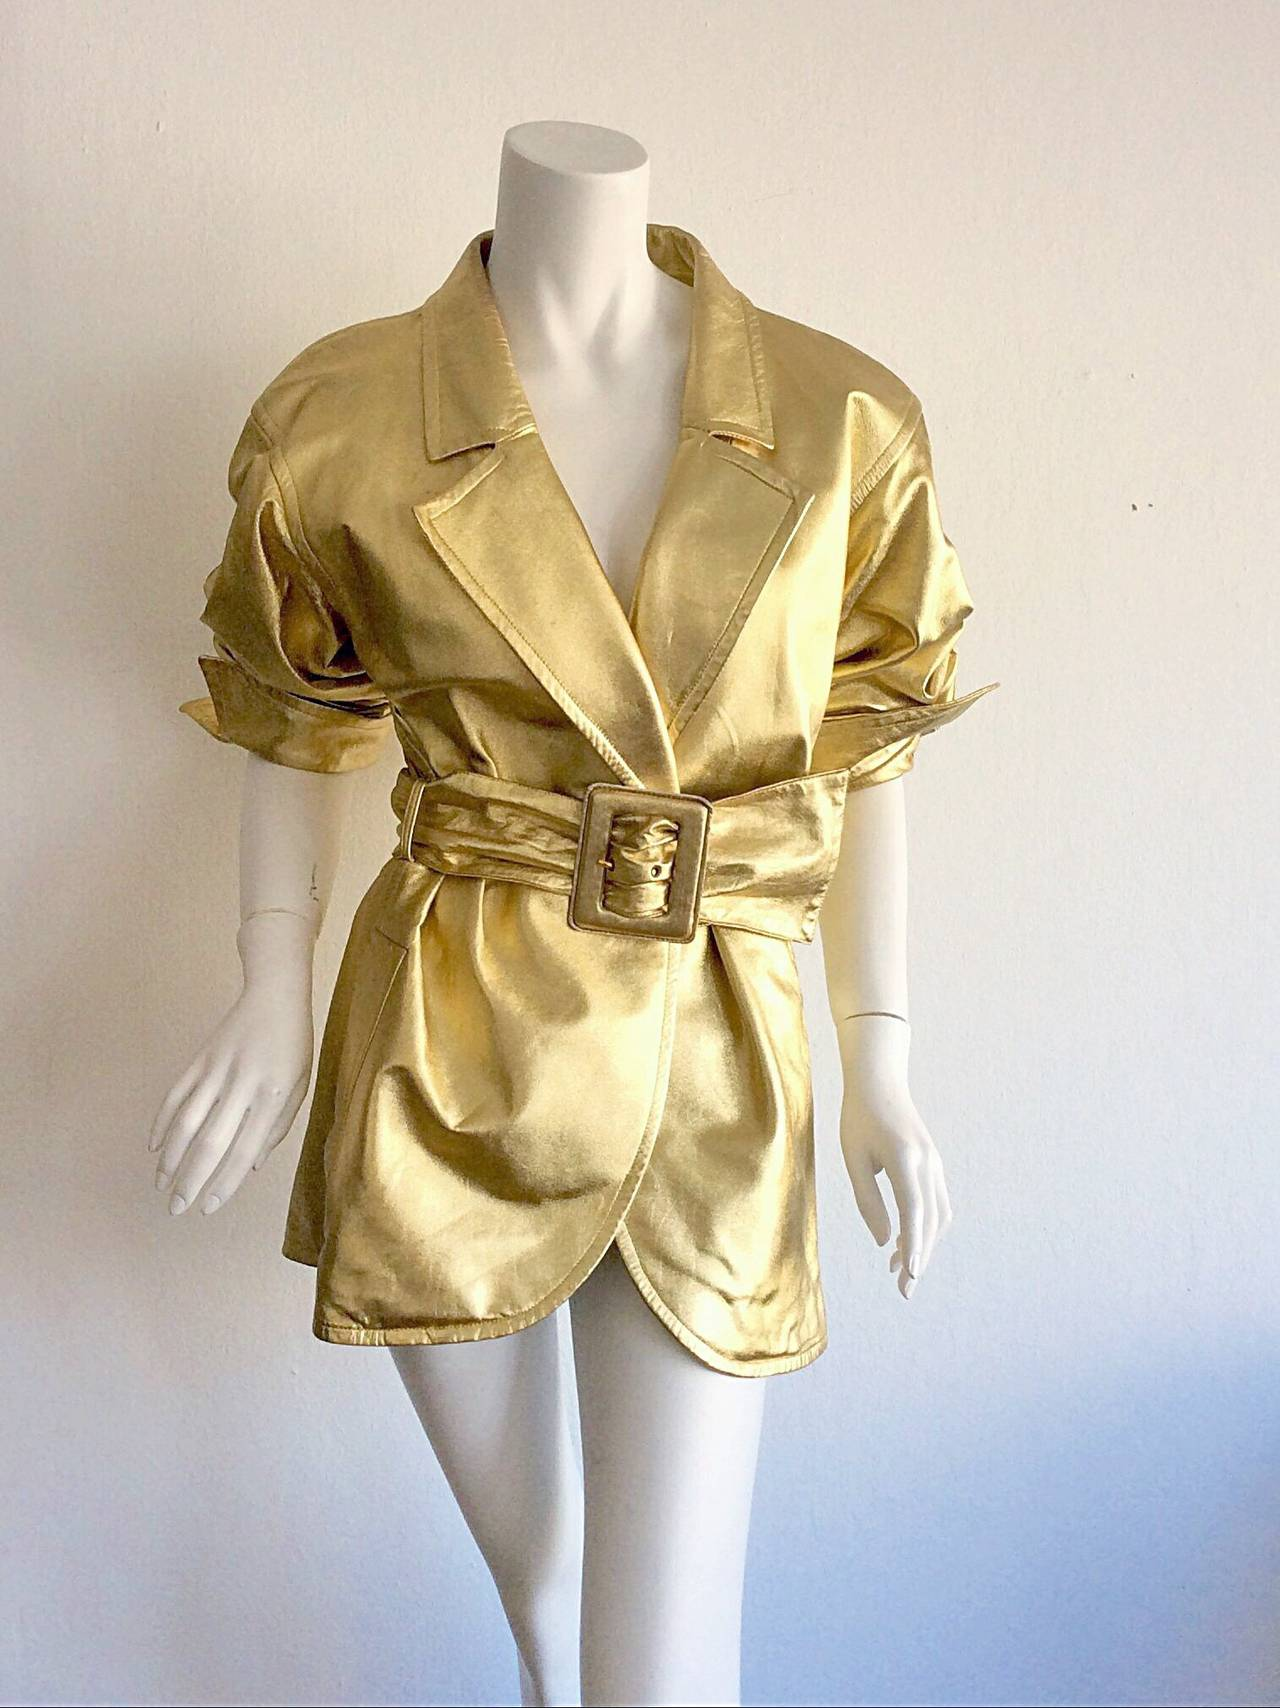 Vintage Yves Saint Laurent ' Rive Gauche ' Belted Gold Leather Jacket 7